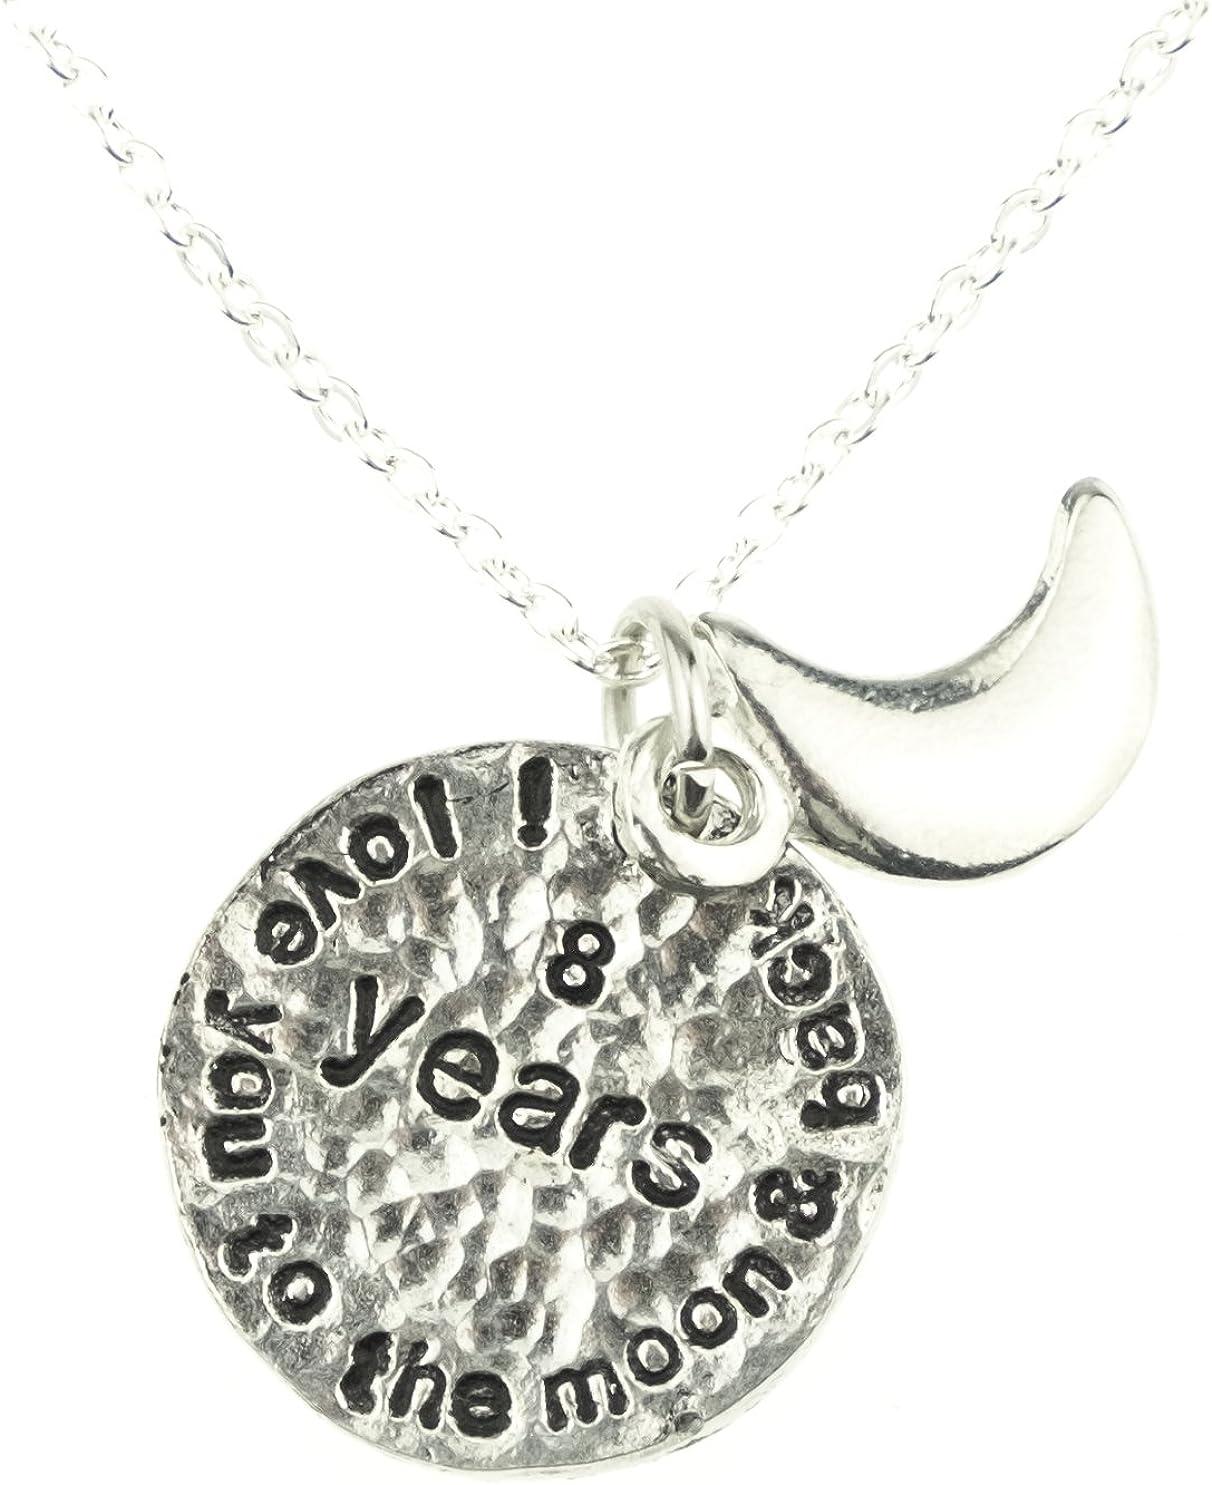 Unique 8th Anniersary Gift Idea Pirantin I Love You to The Moon and Back 8th Wedding Anniversary Necklace